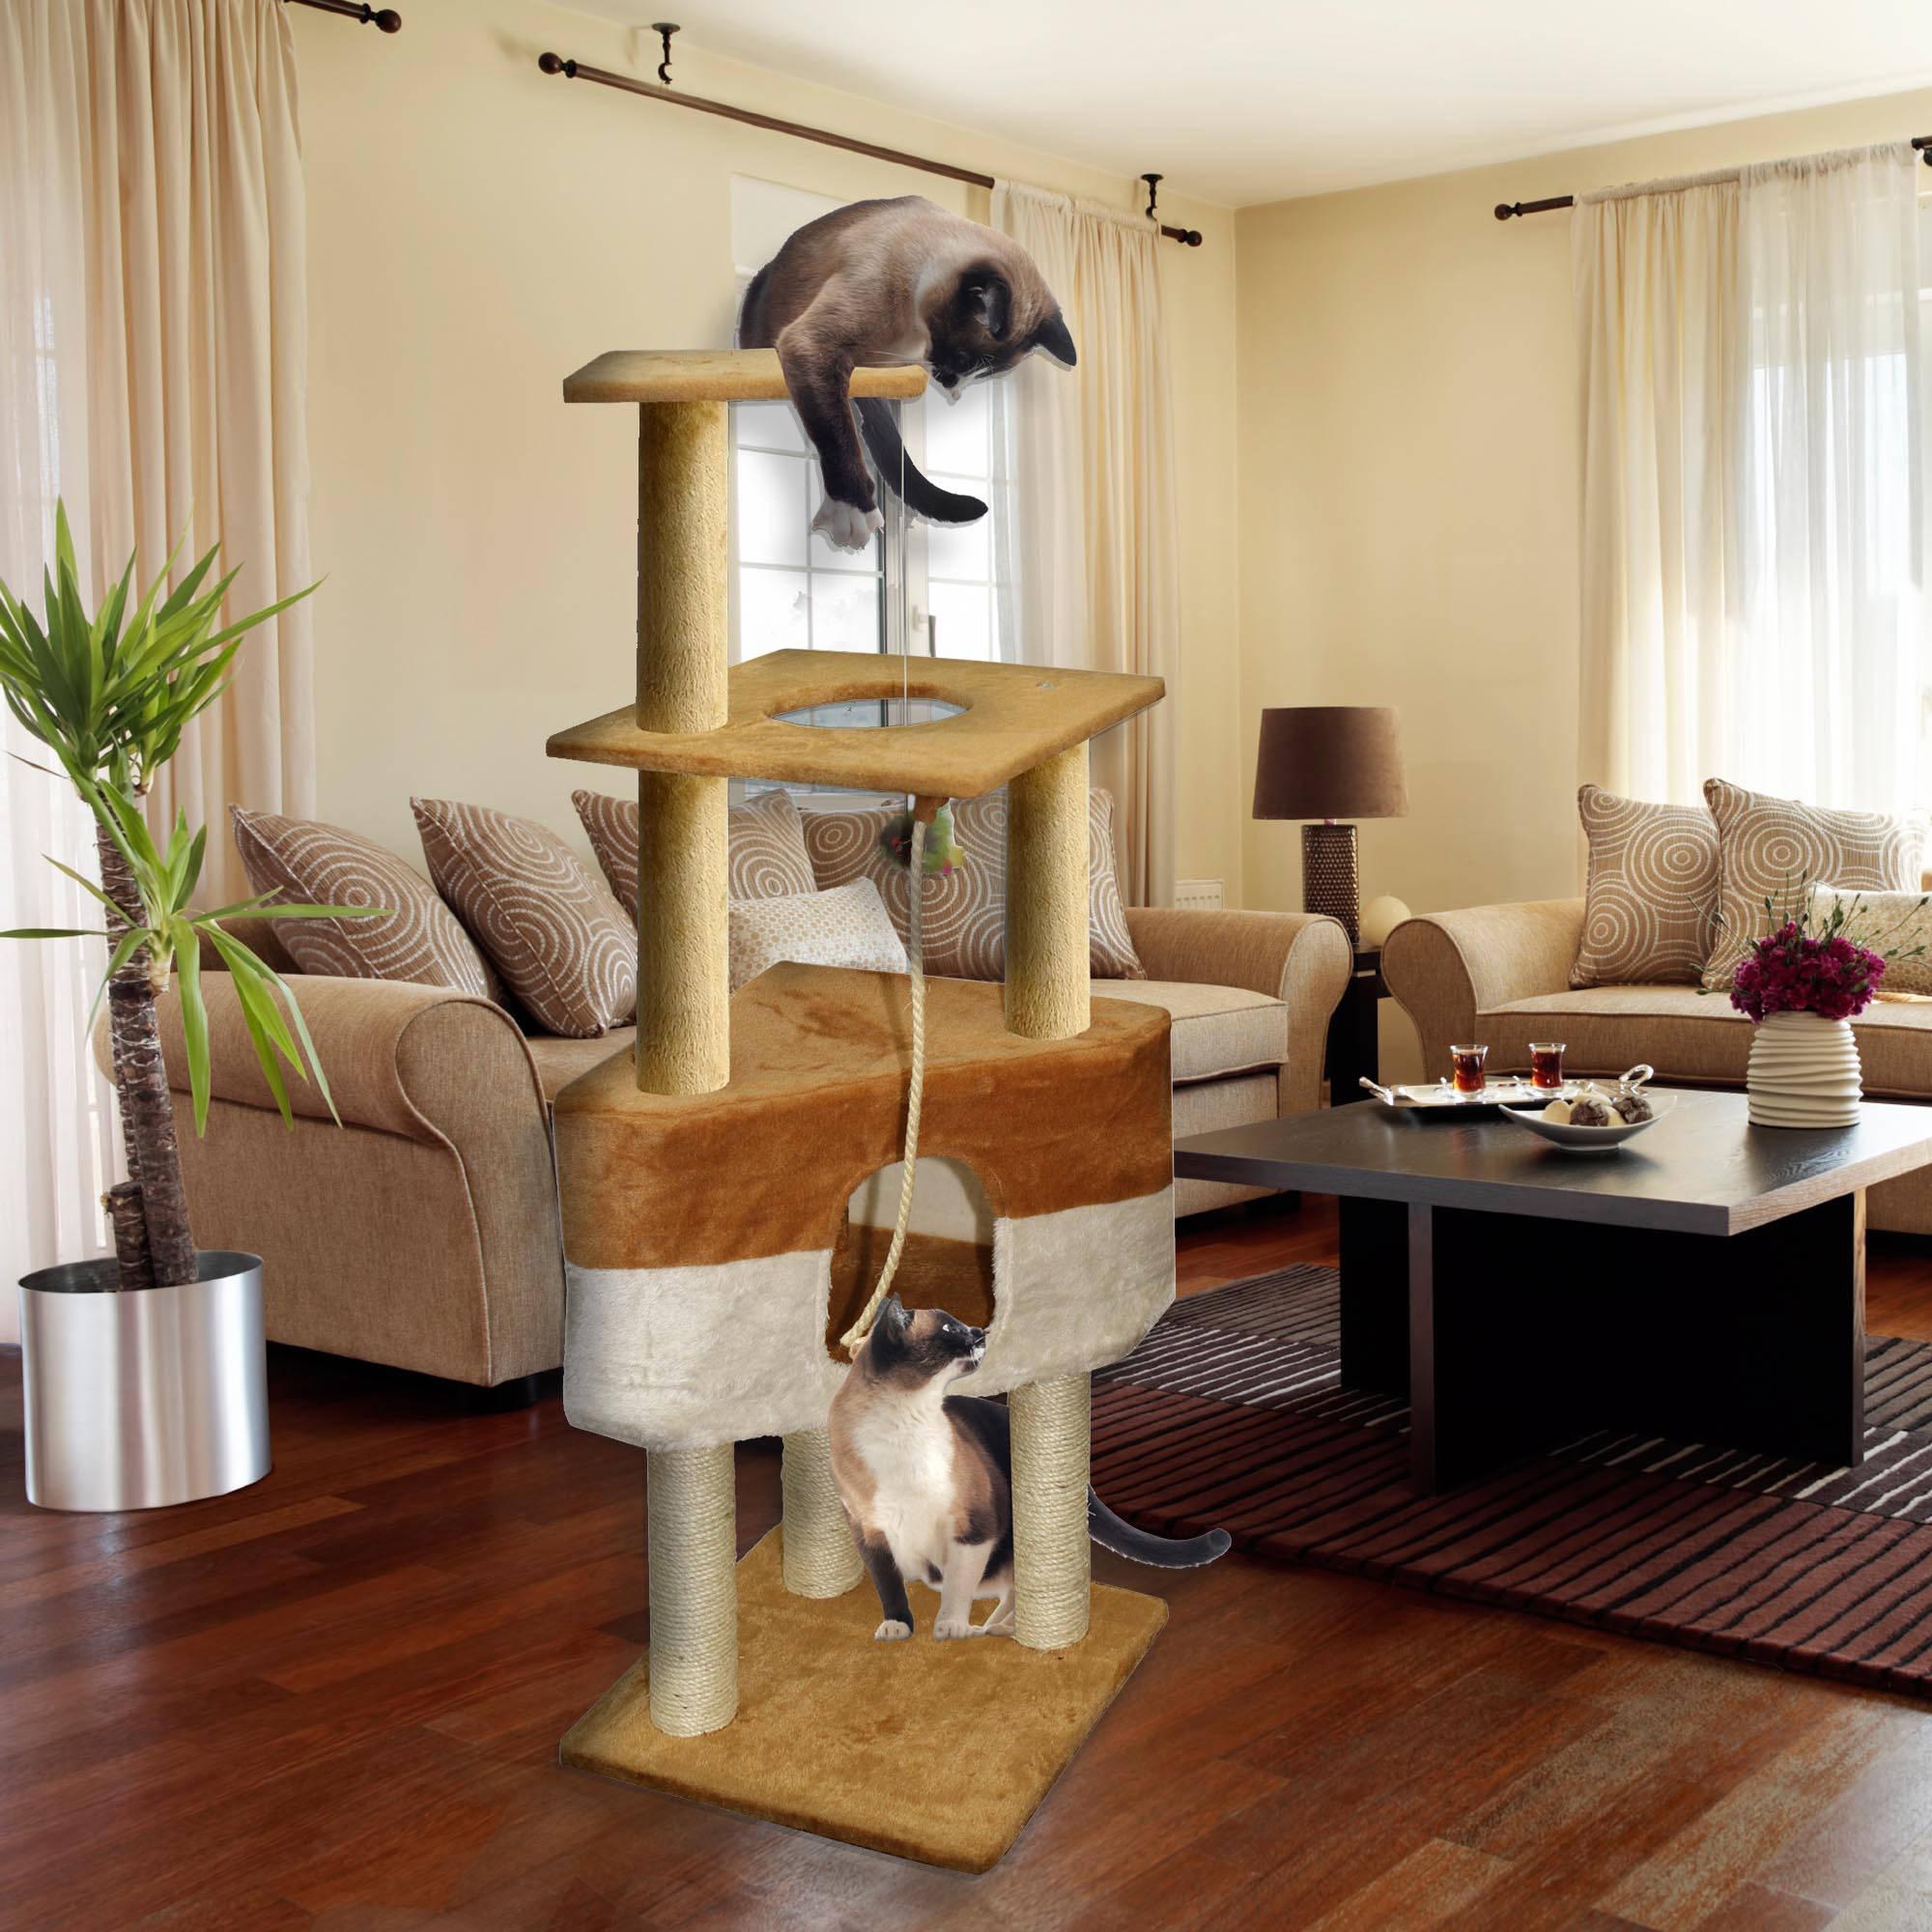 "Premium Cat Tree Tower Condo Scratch Furniture, 50"", Brown and Tan"